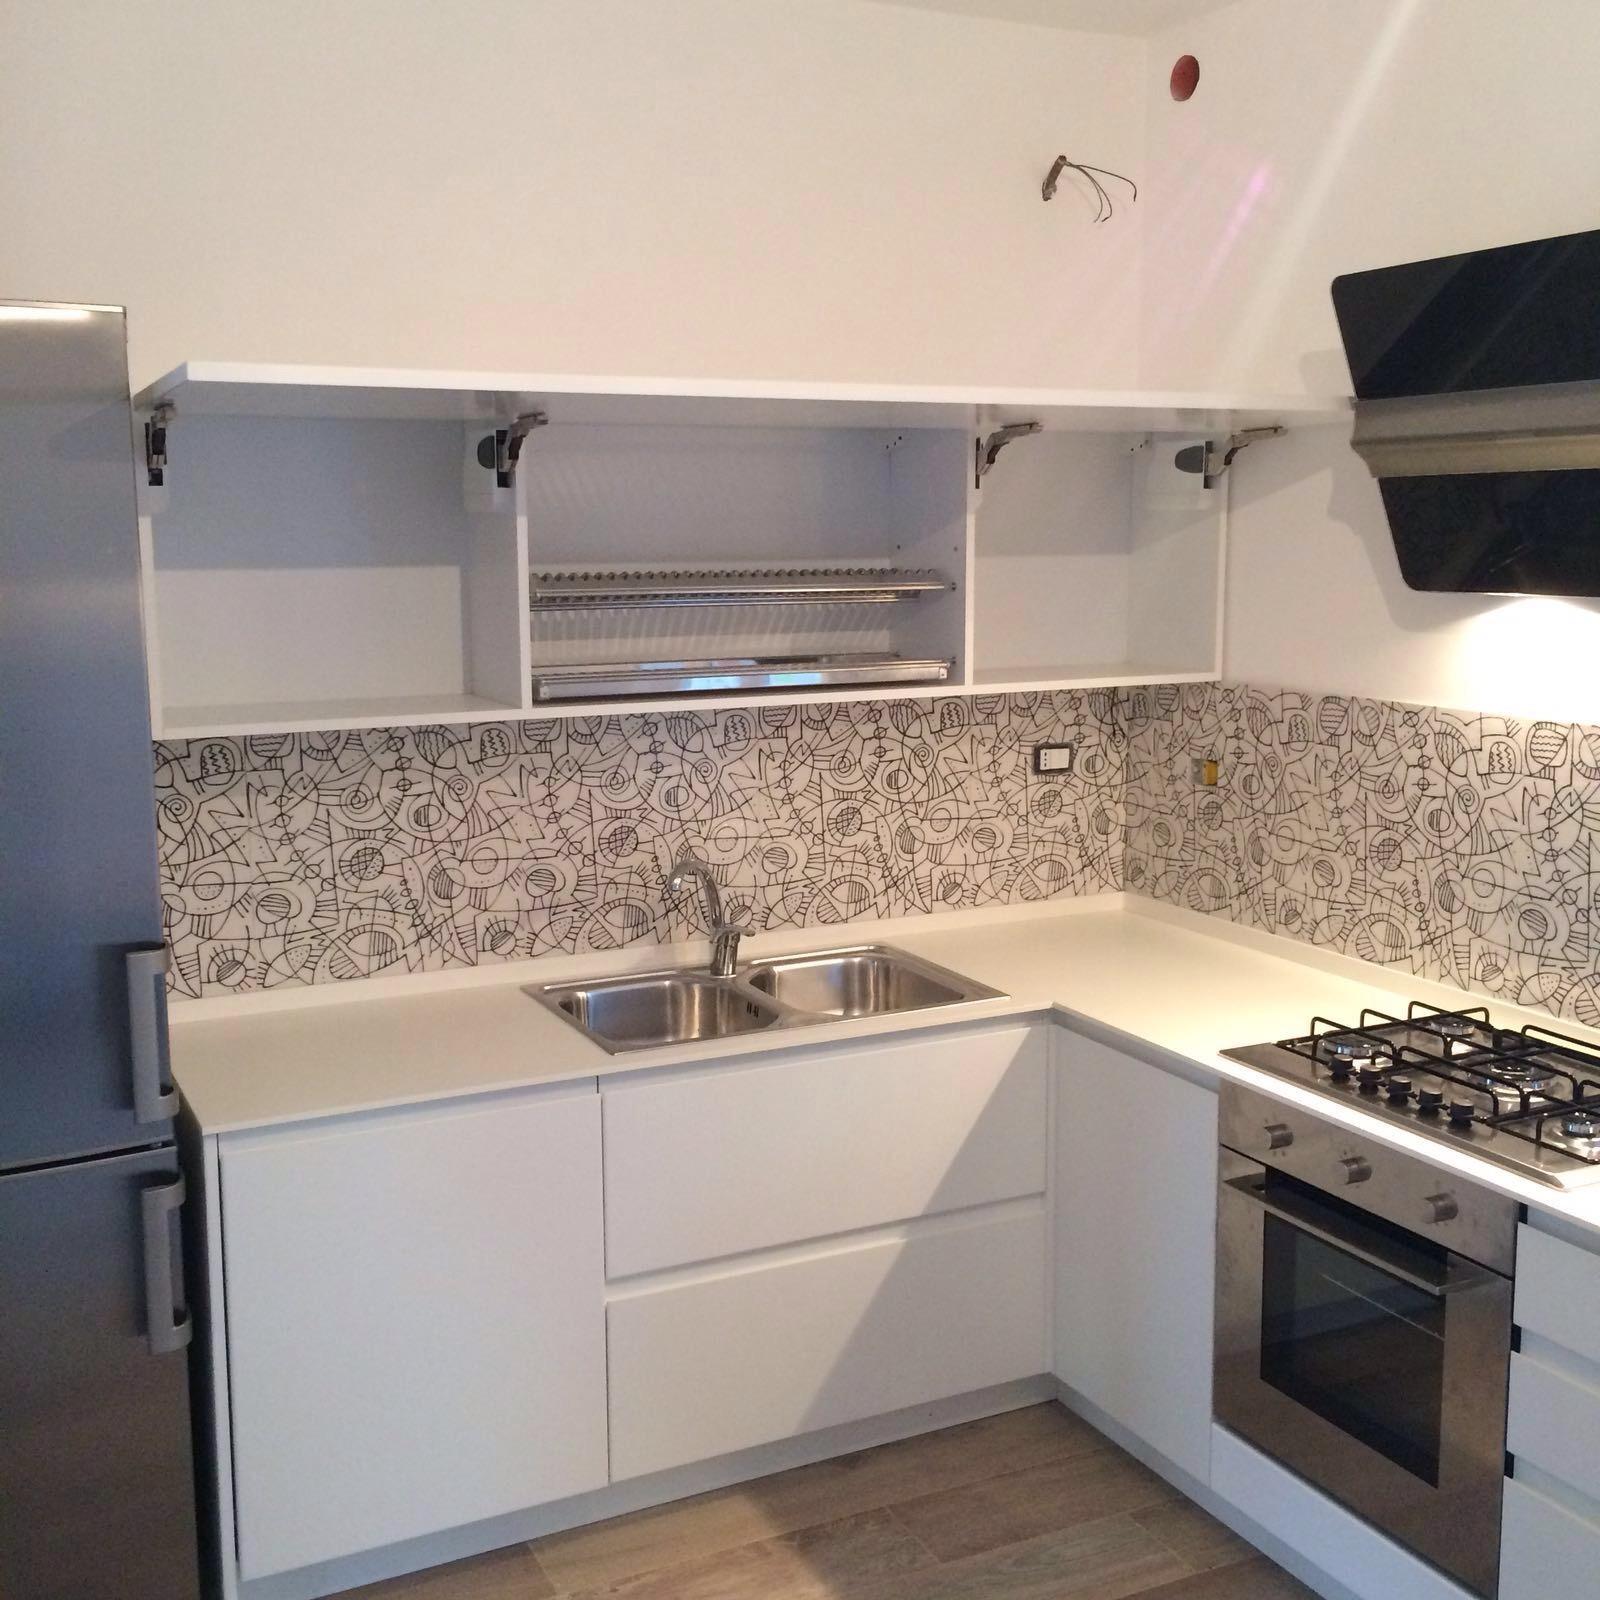 Cucina Artigianale Moderna.Cucina Basile